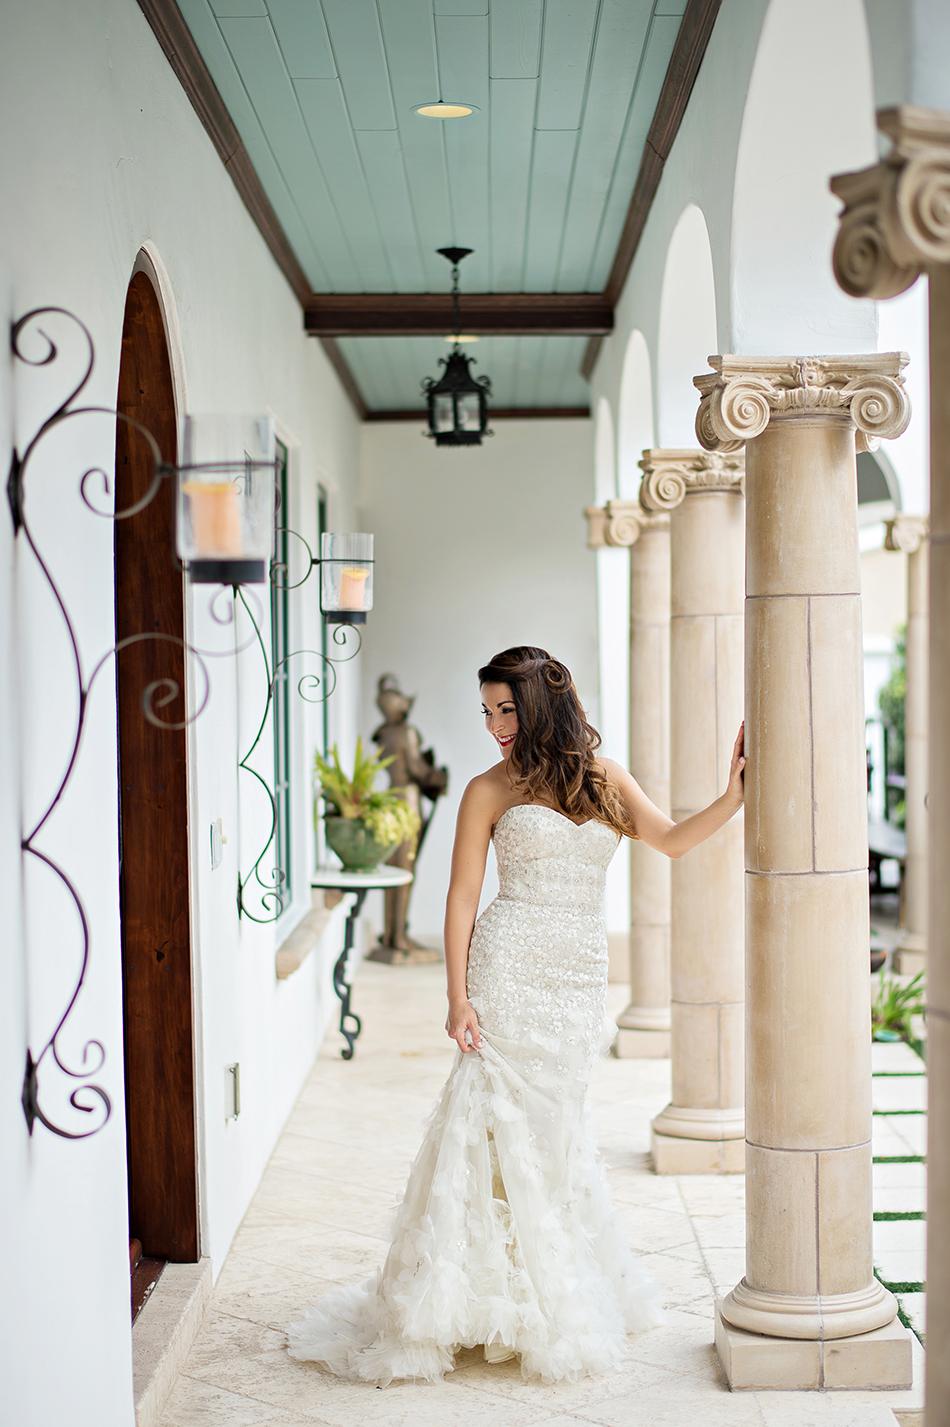 Romona Keveza gown